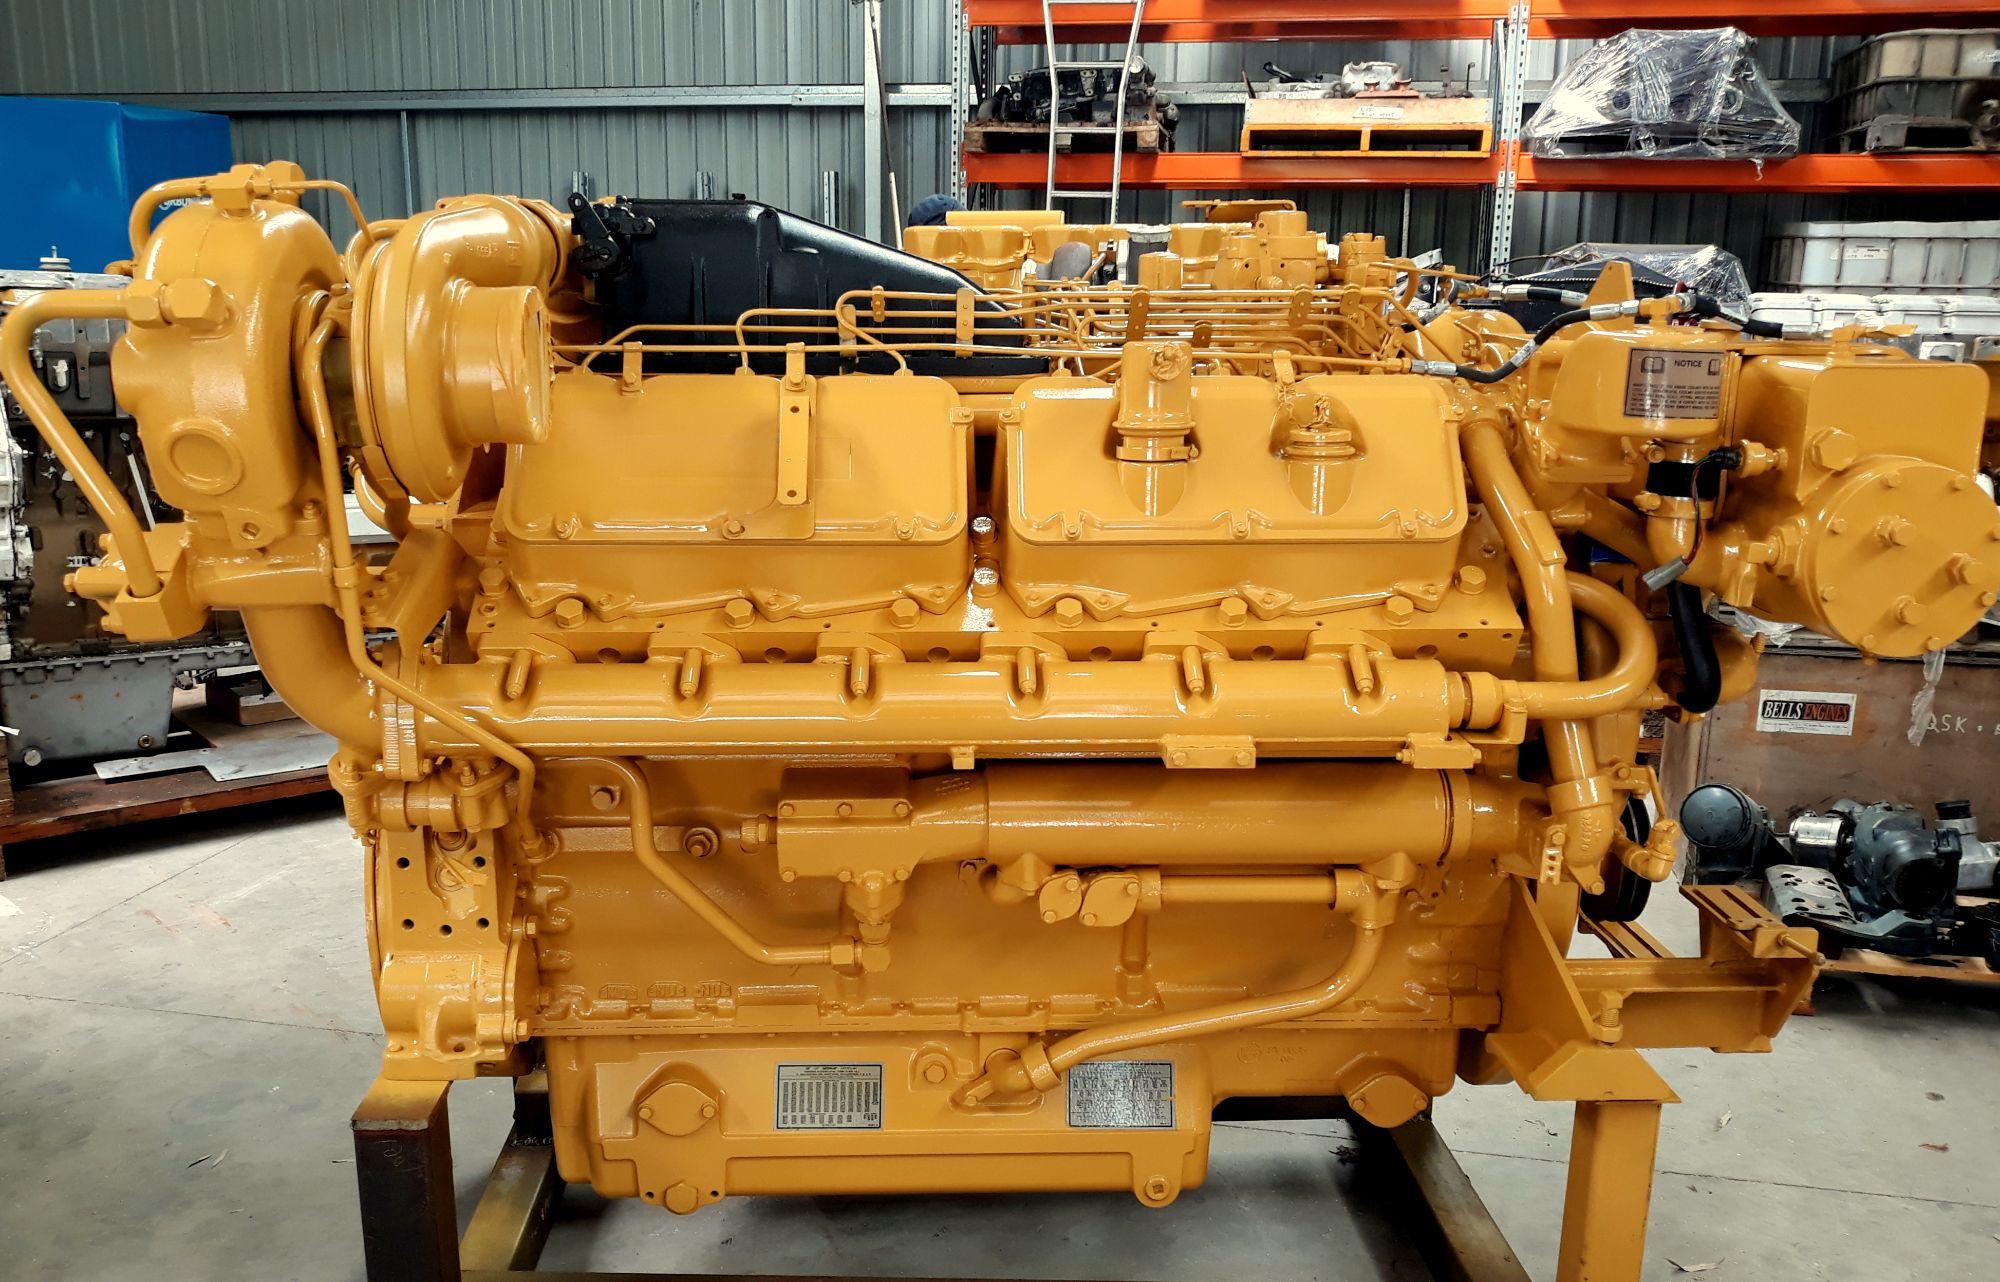 CAT 3412 Marine Engine